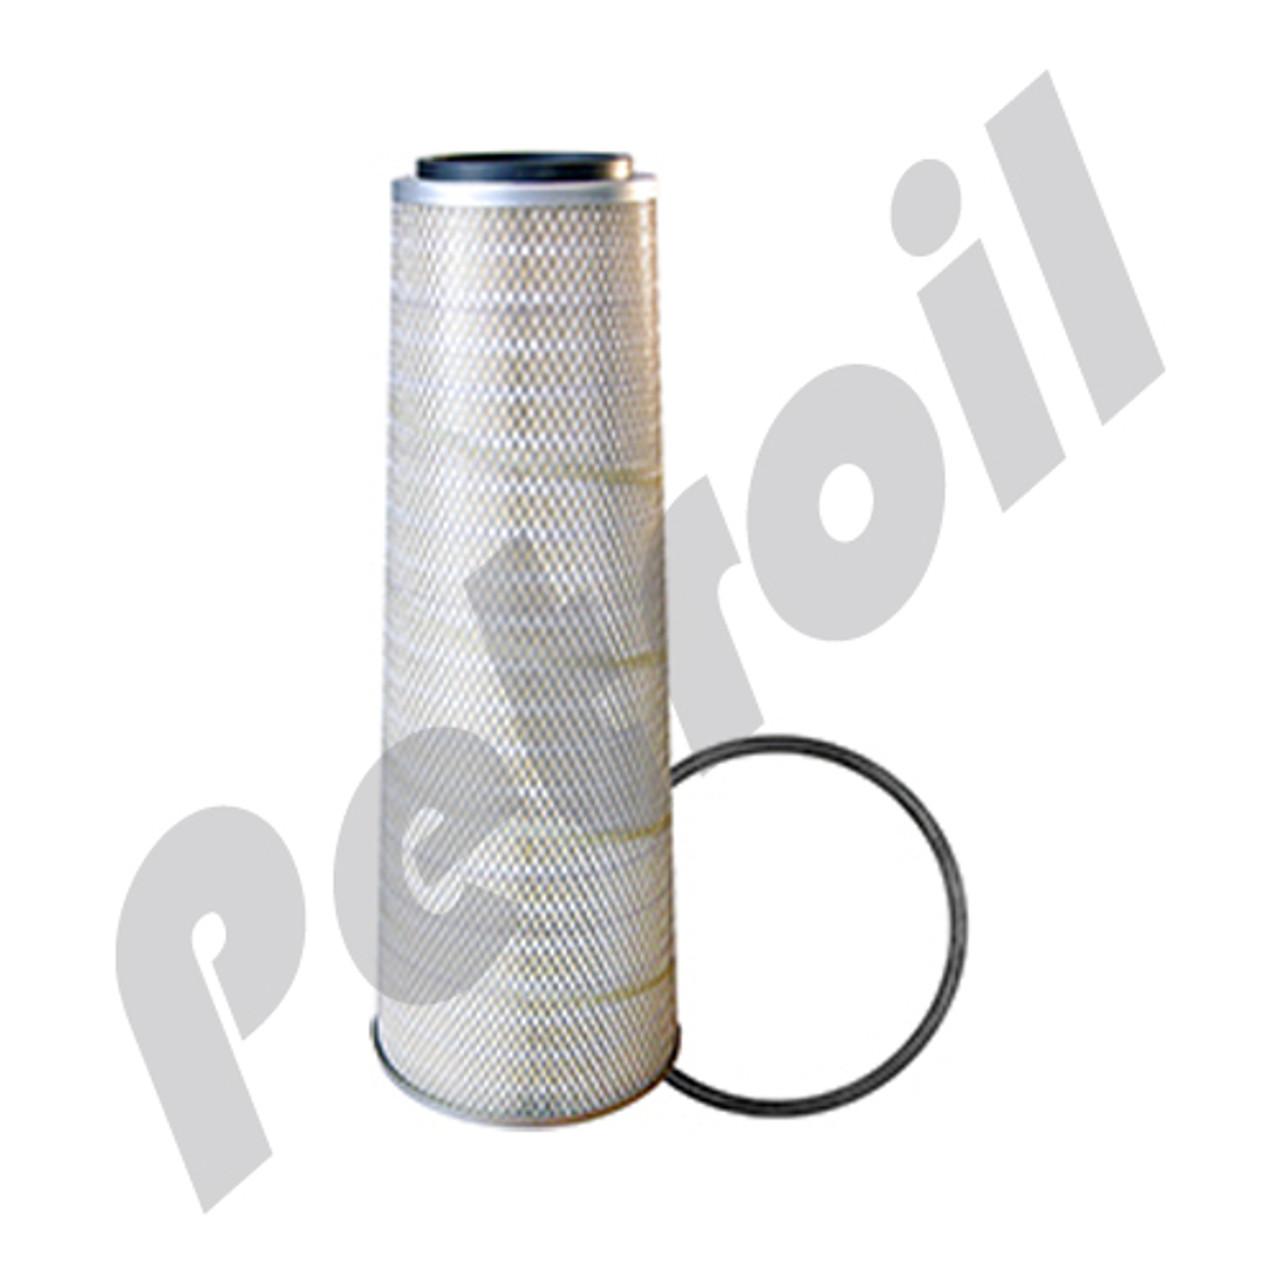 8-1//4 x 17-1//8 in. Baldwin Filters PA2957 Heavy Duty Air Filter